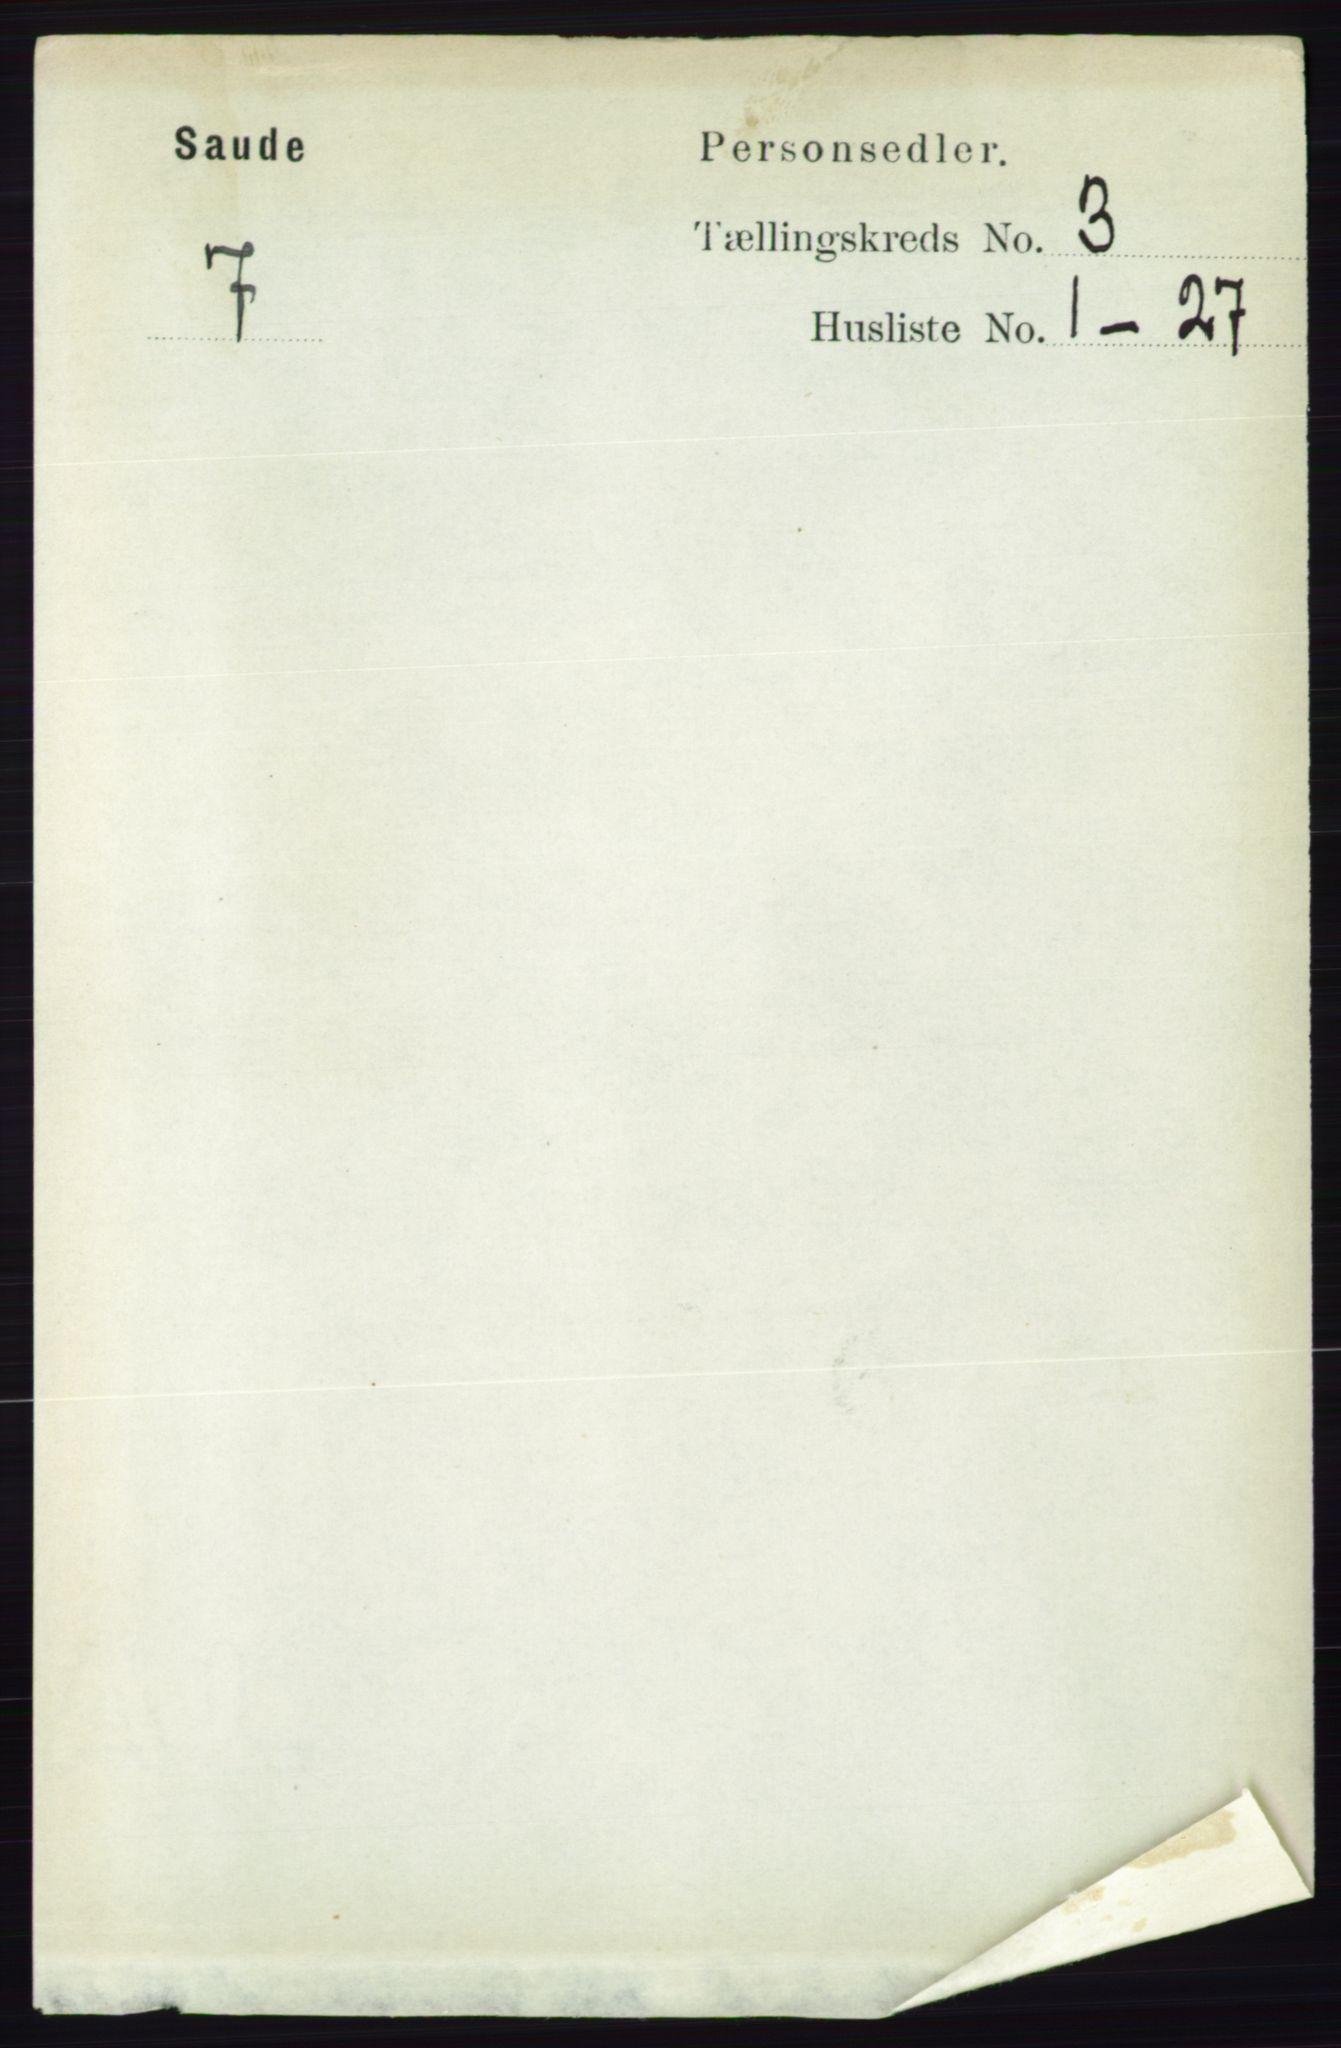 RA, Folketelling 1891 for 0822 Sauherad herred, 1891, s. 730